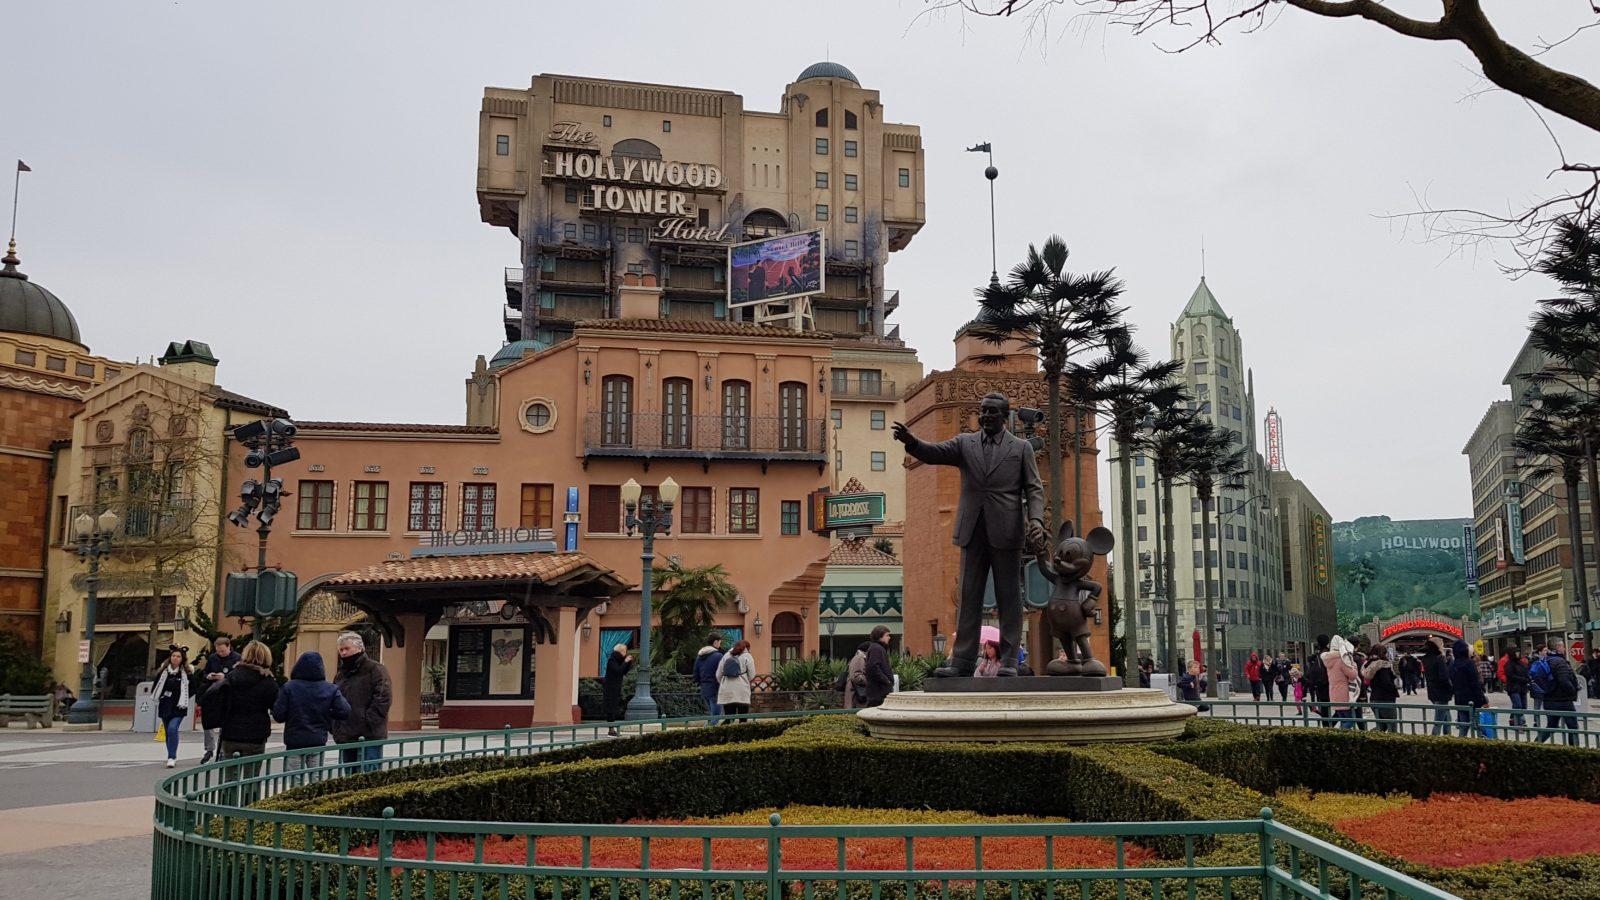 A long shot of the Tower of Terror, a Disneyland Paris ride